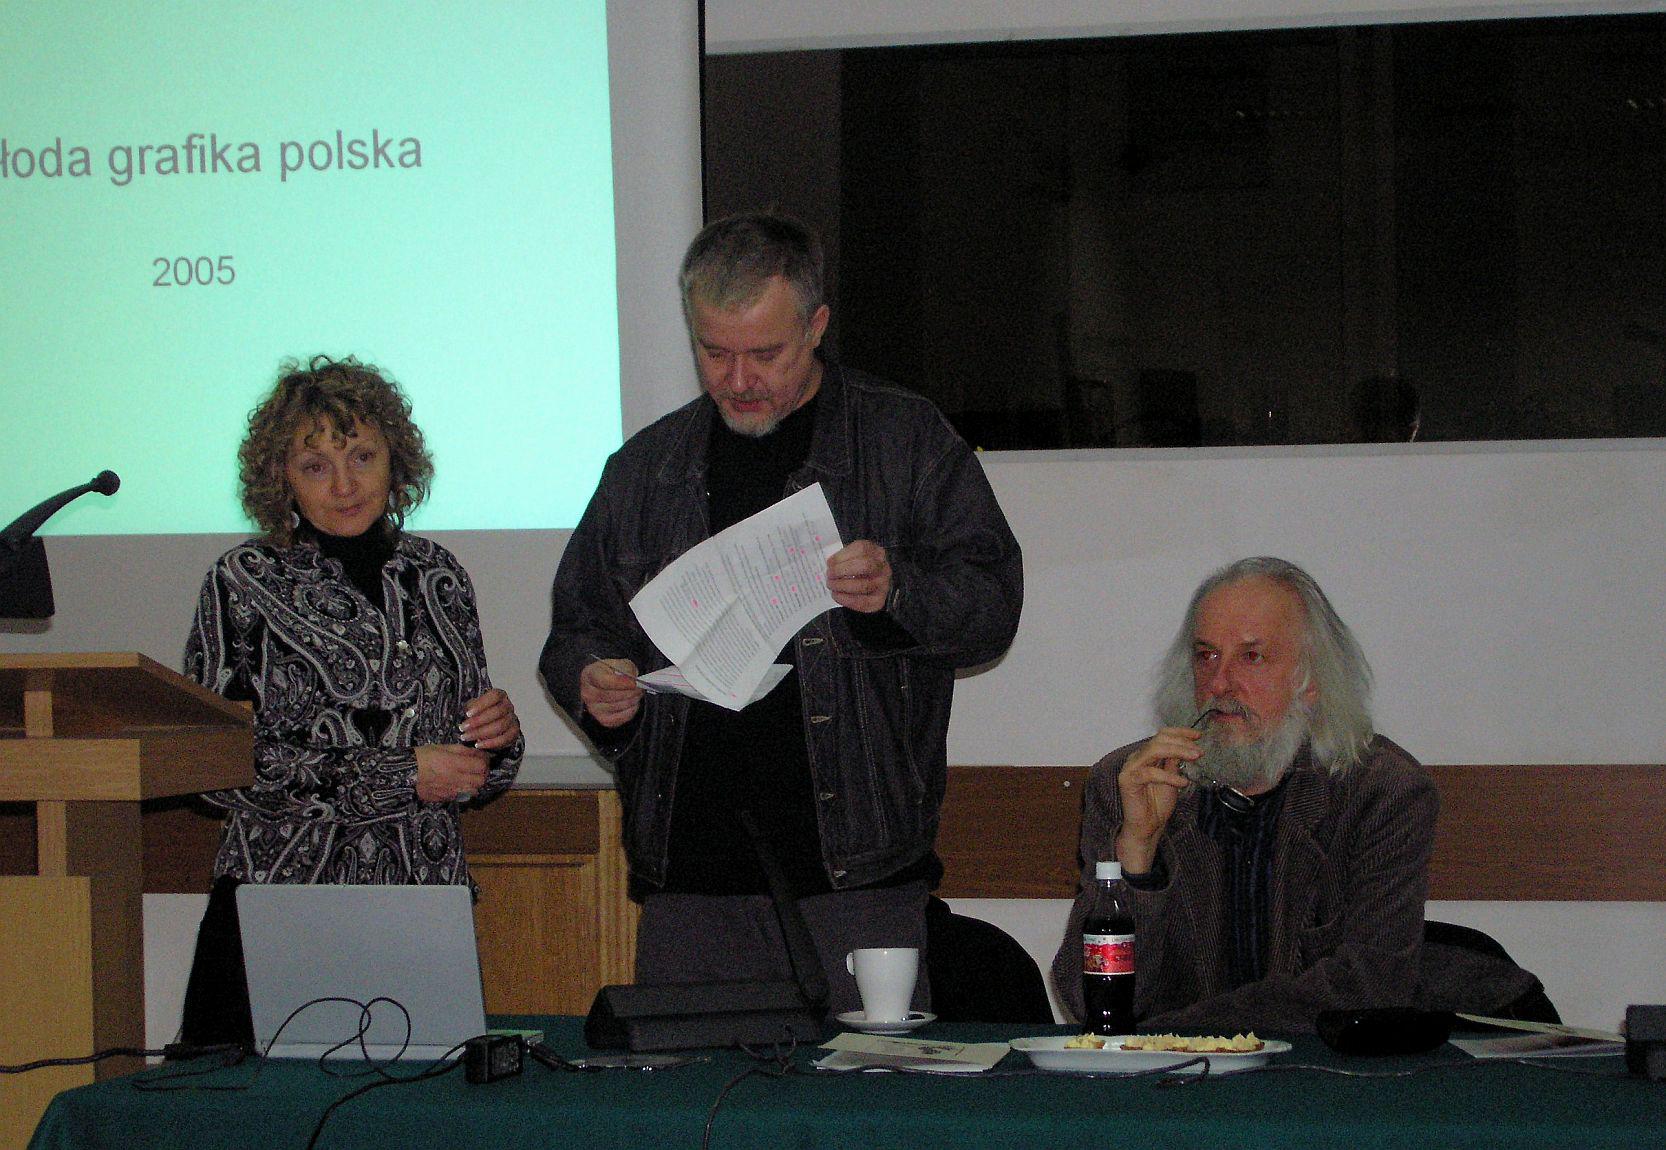 5mloda grafika polska 2005 (7).jpg